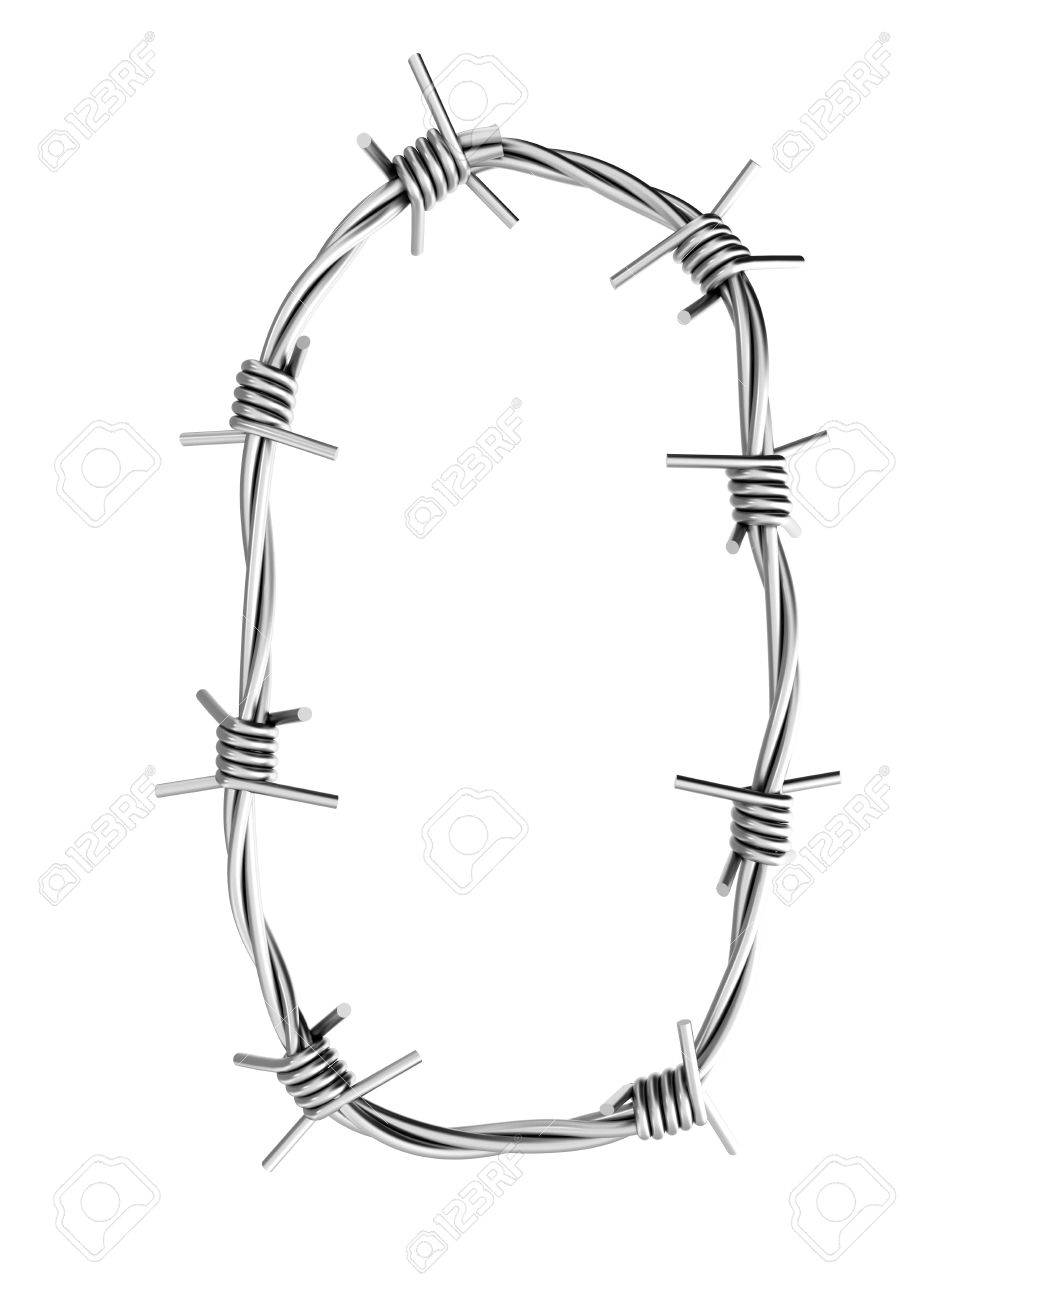 Barbed wire alphabet, 0 Stock Photo - 8043087